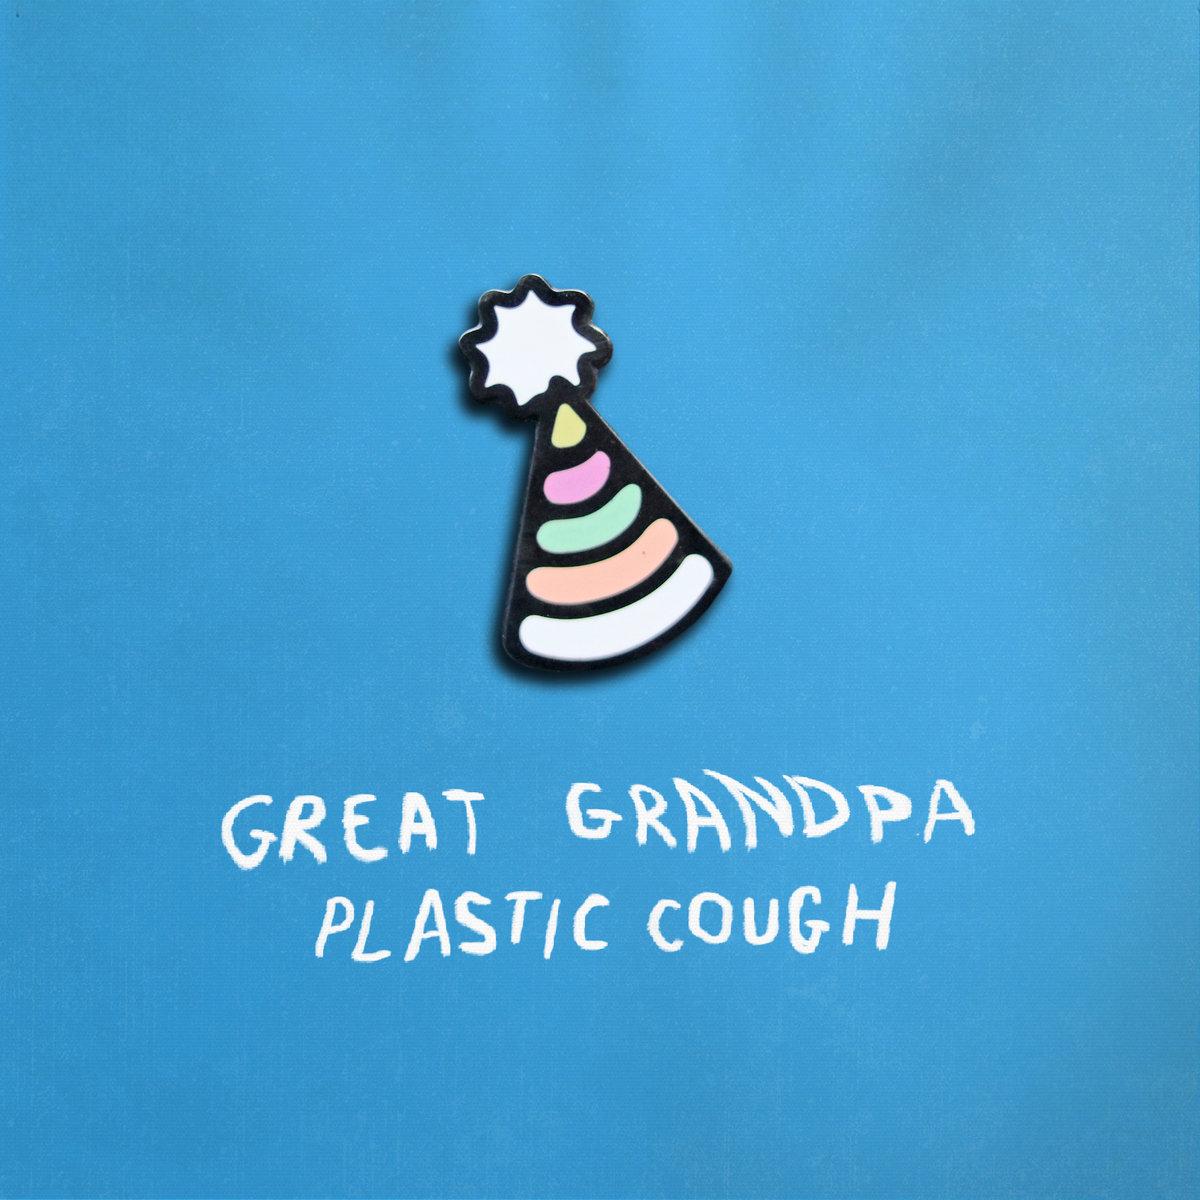 Great Grandpa - Plastic Cough [LP] (Blue vinyl)